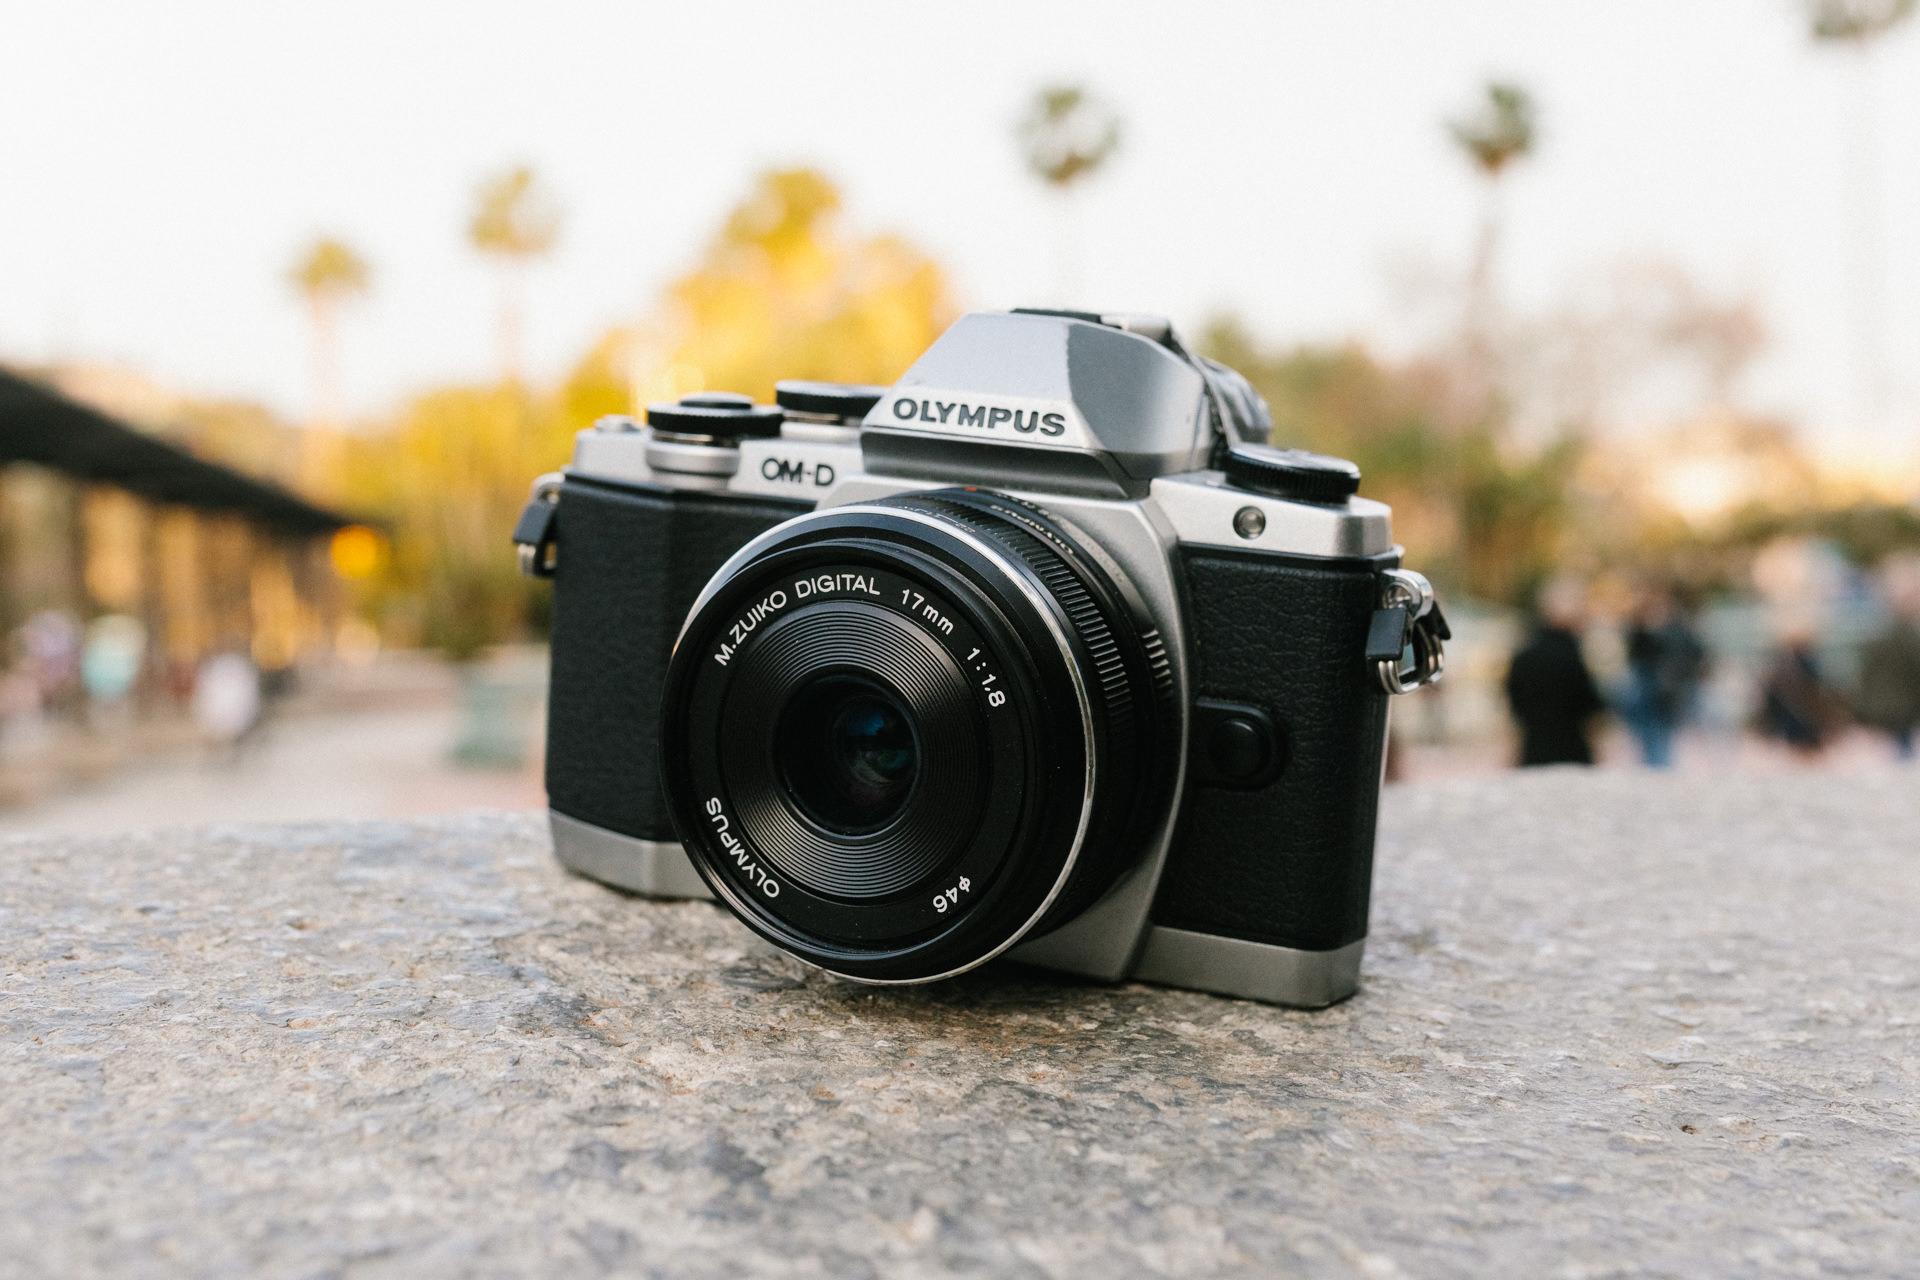 Olympus 17mm f1.8 - Kompaktes Reiseobjektiv für Micro Four Thirds